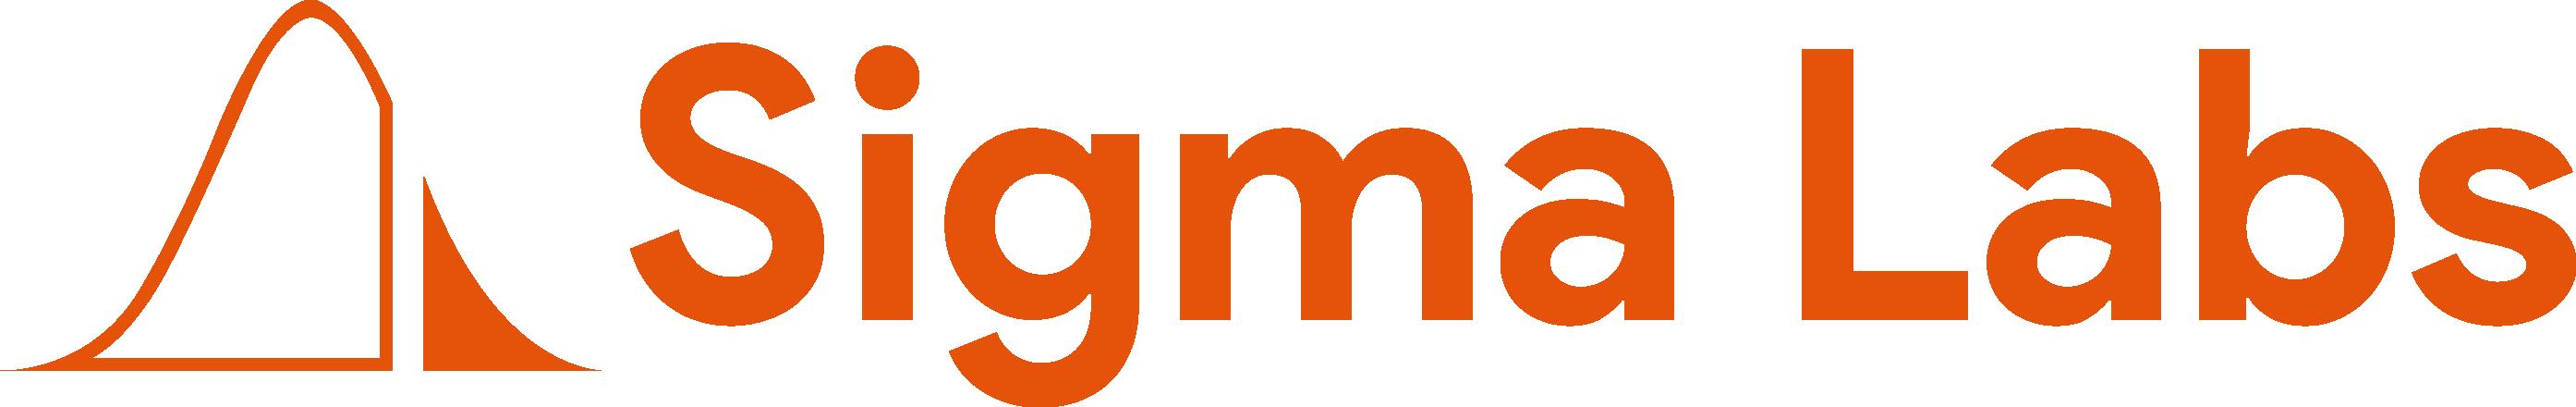 Sigma Labs XYZ Company Logo